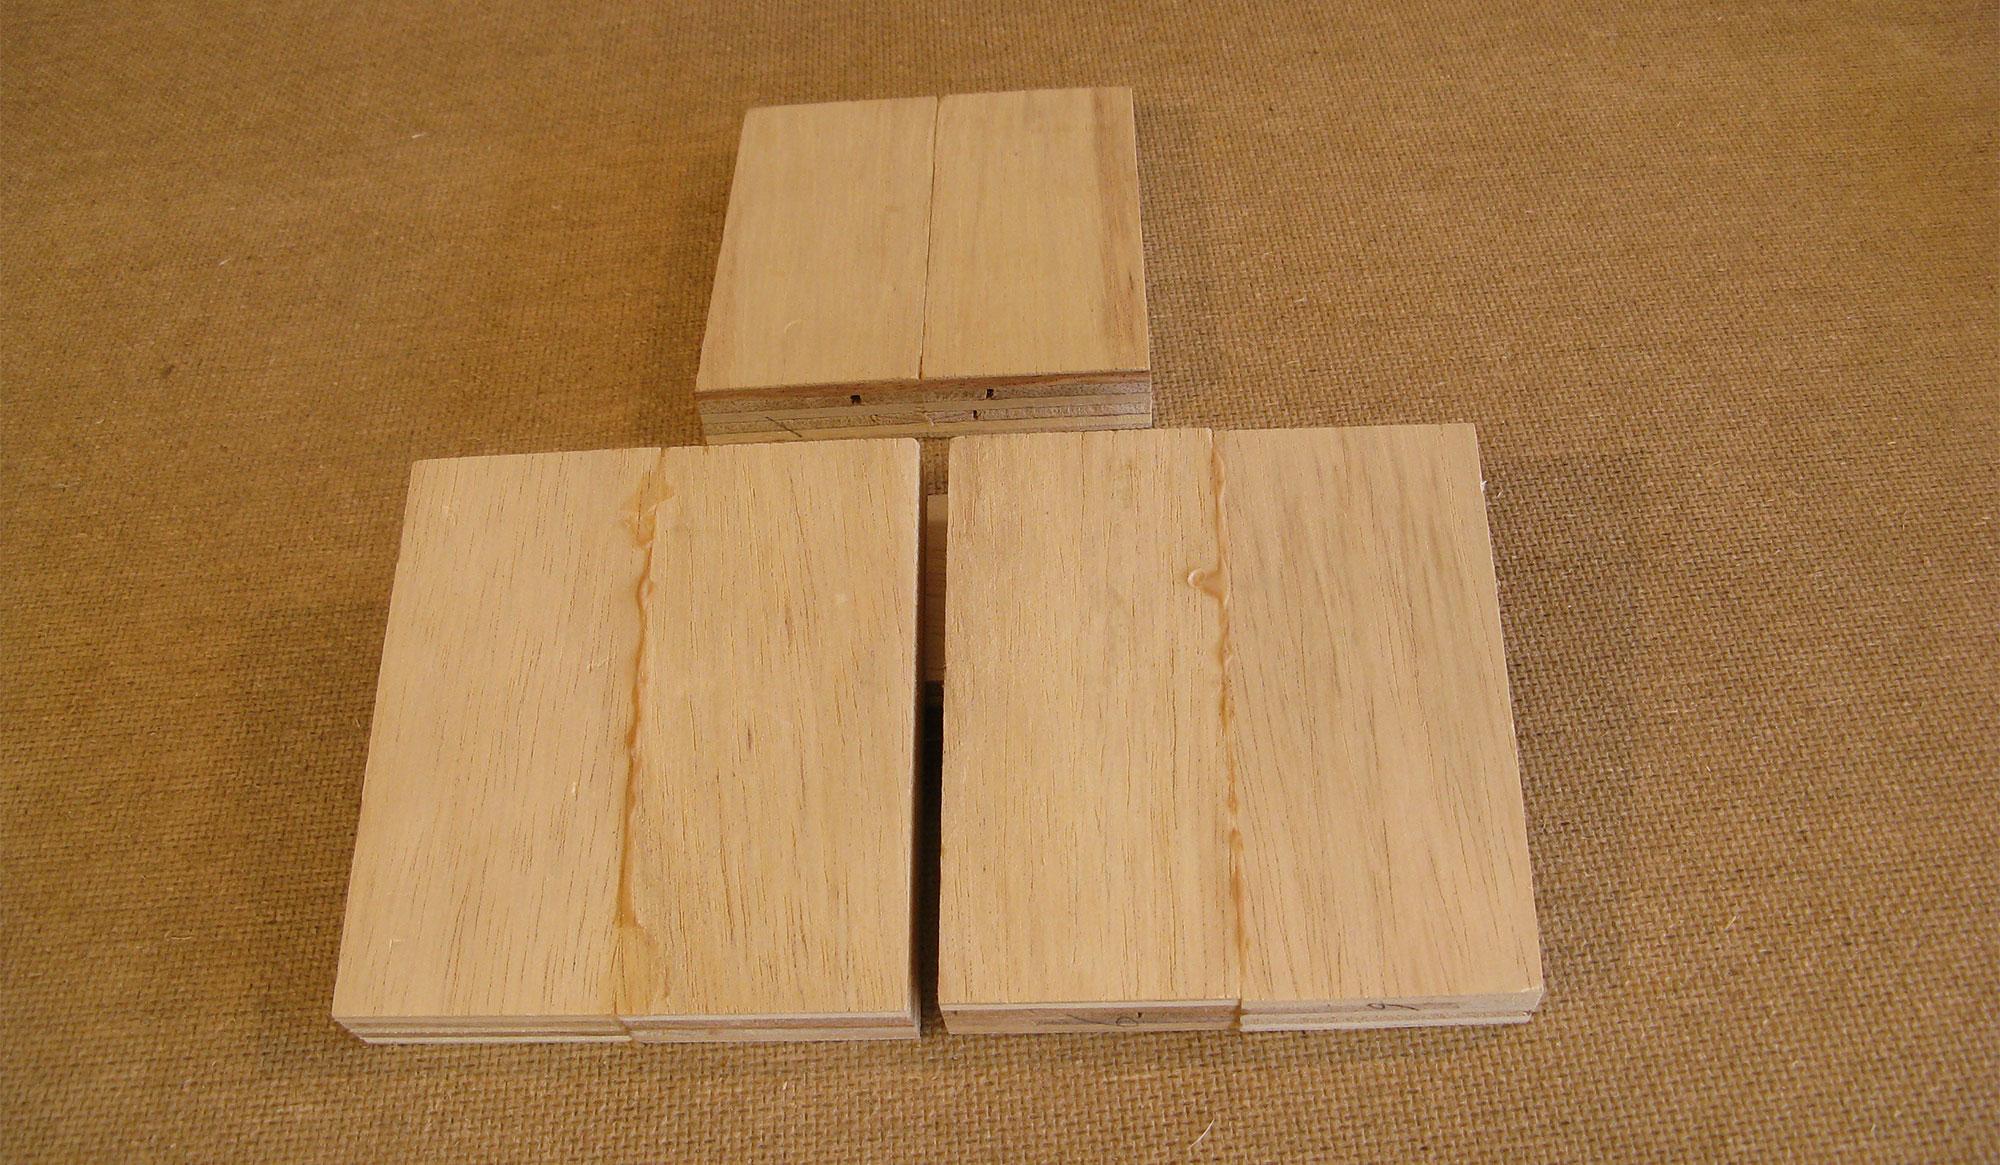 Three glued wooden blocks.